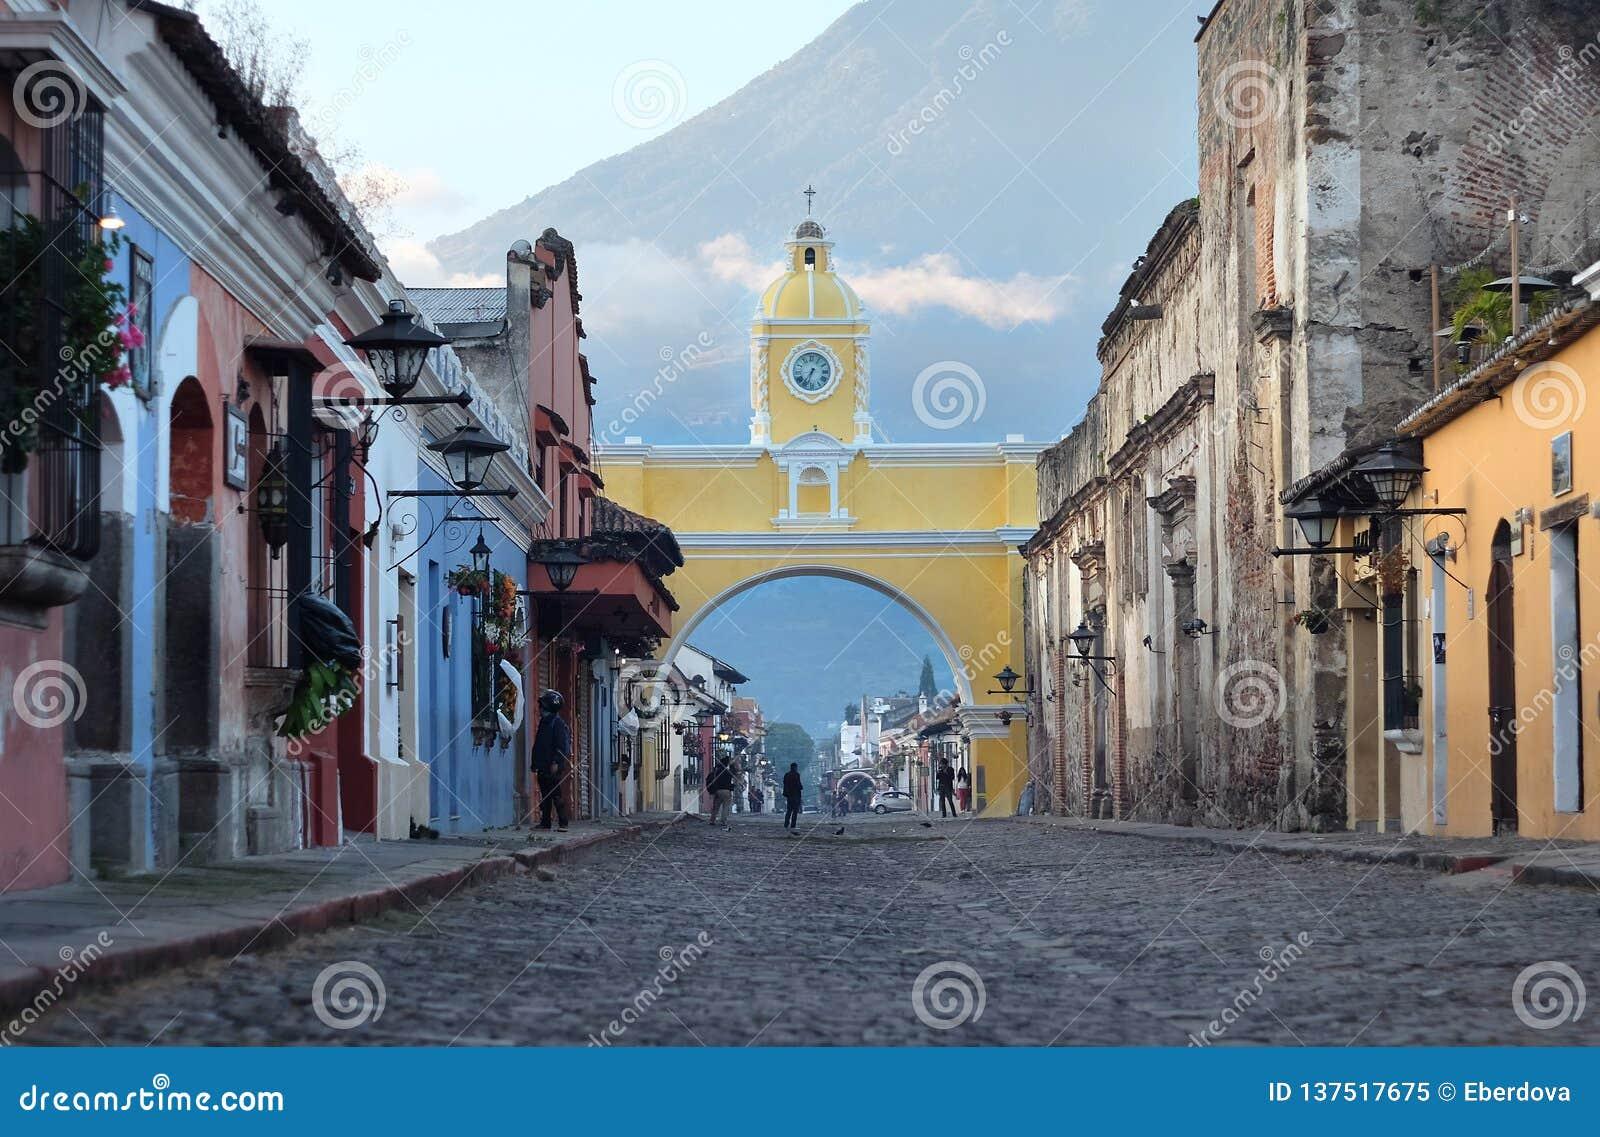 Santa Catalina Arch - one of the major attractions in Antigua City, Guatemala.